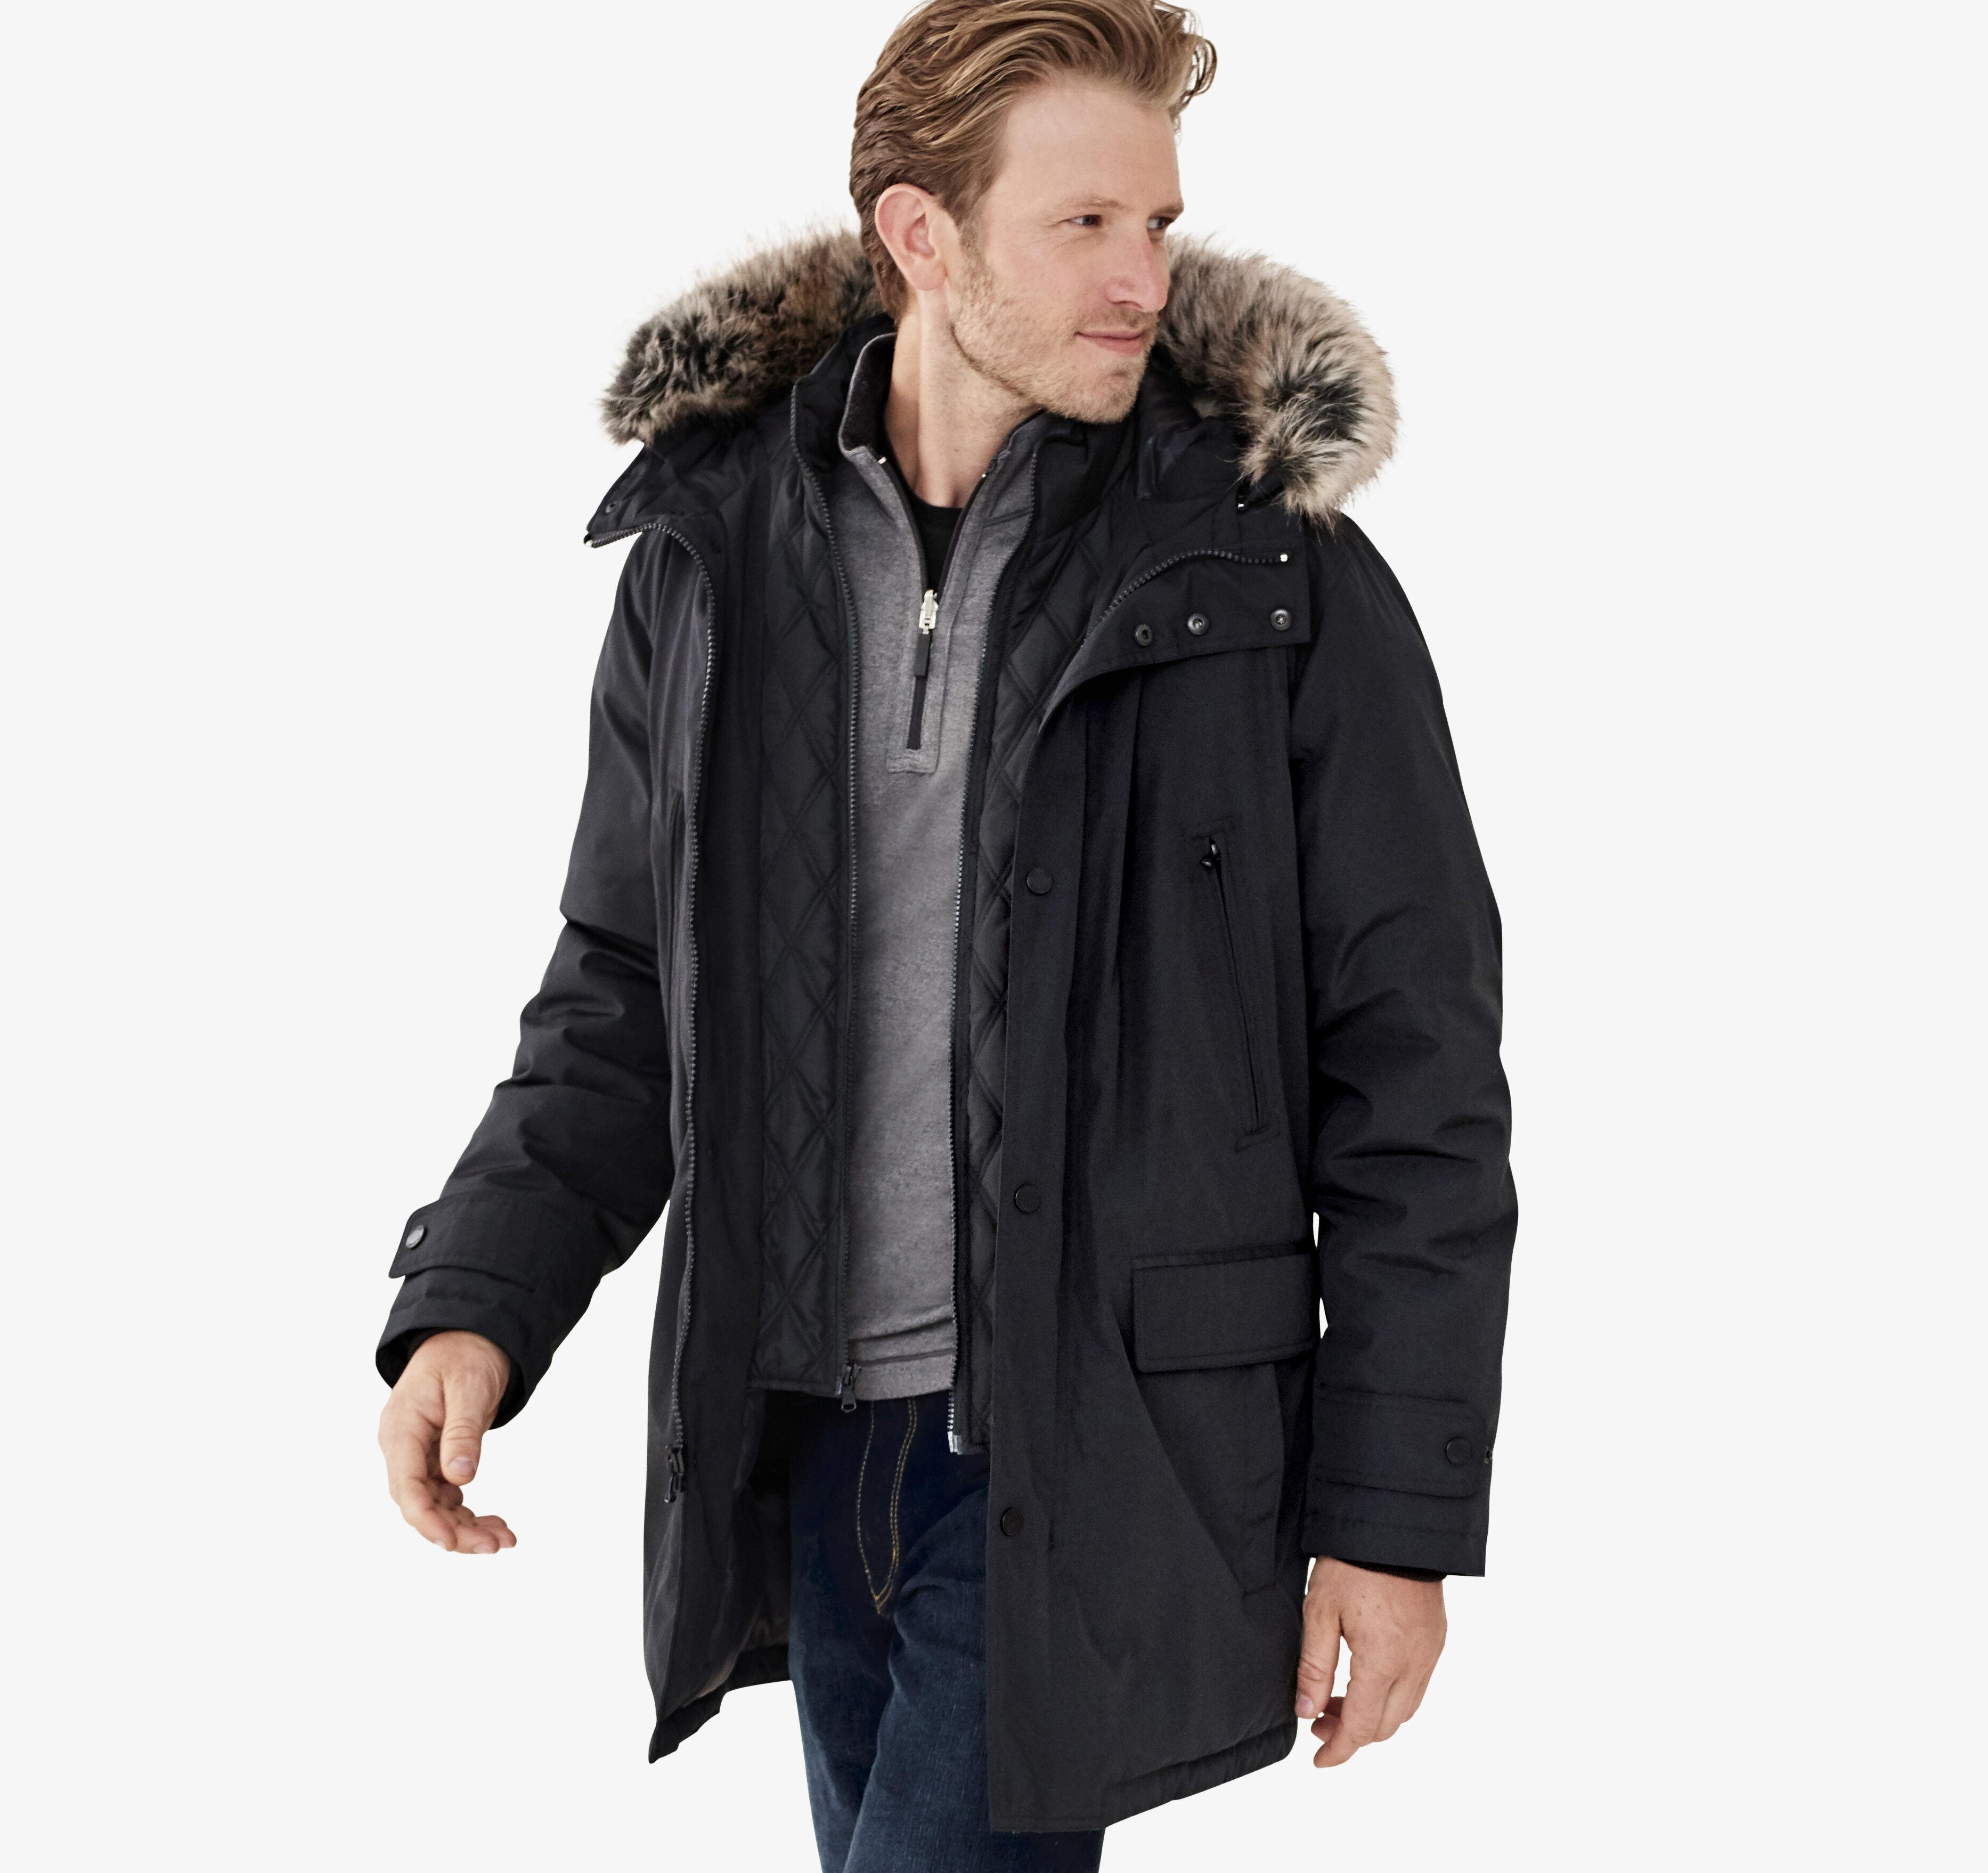 XC4® Faux Fur Trimmed Hooded Parka Johnston & Murphy  Johnston & Murphy